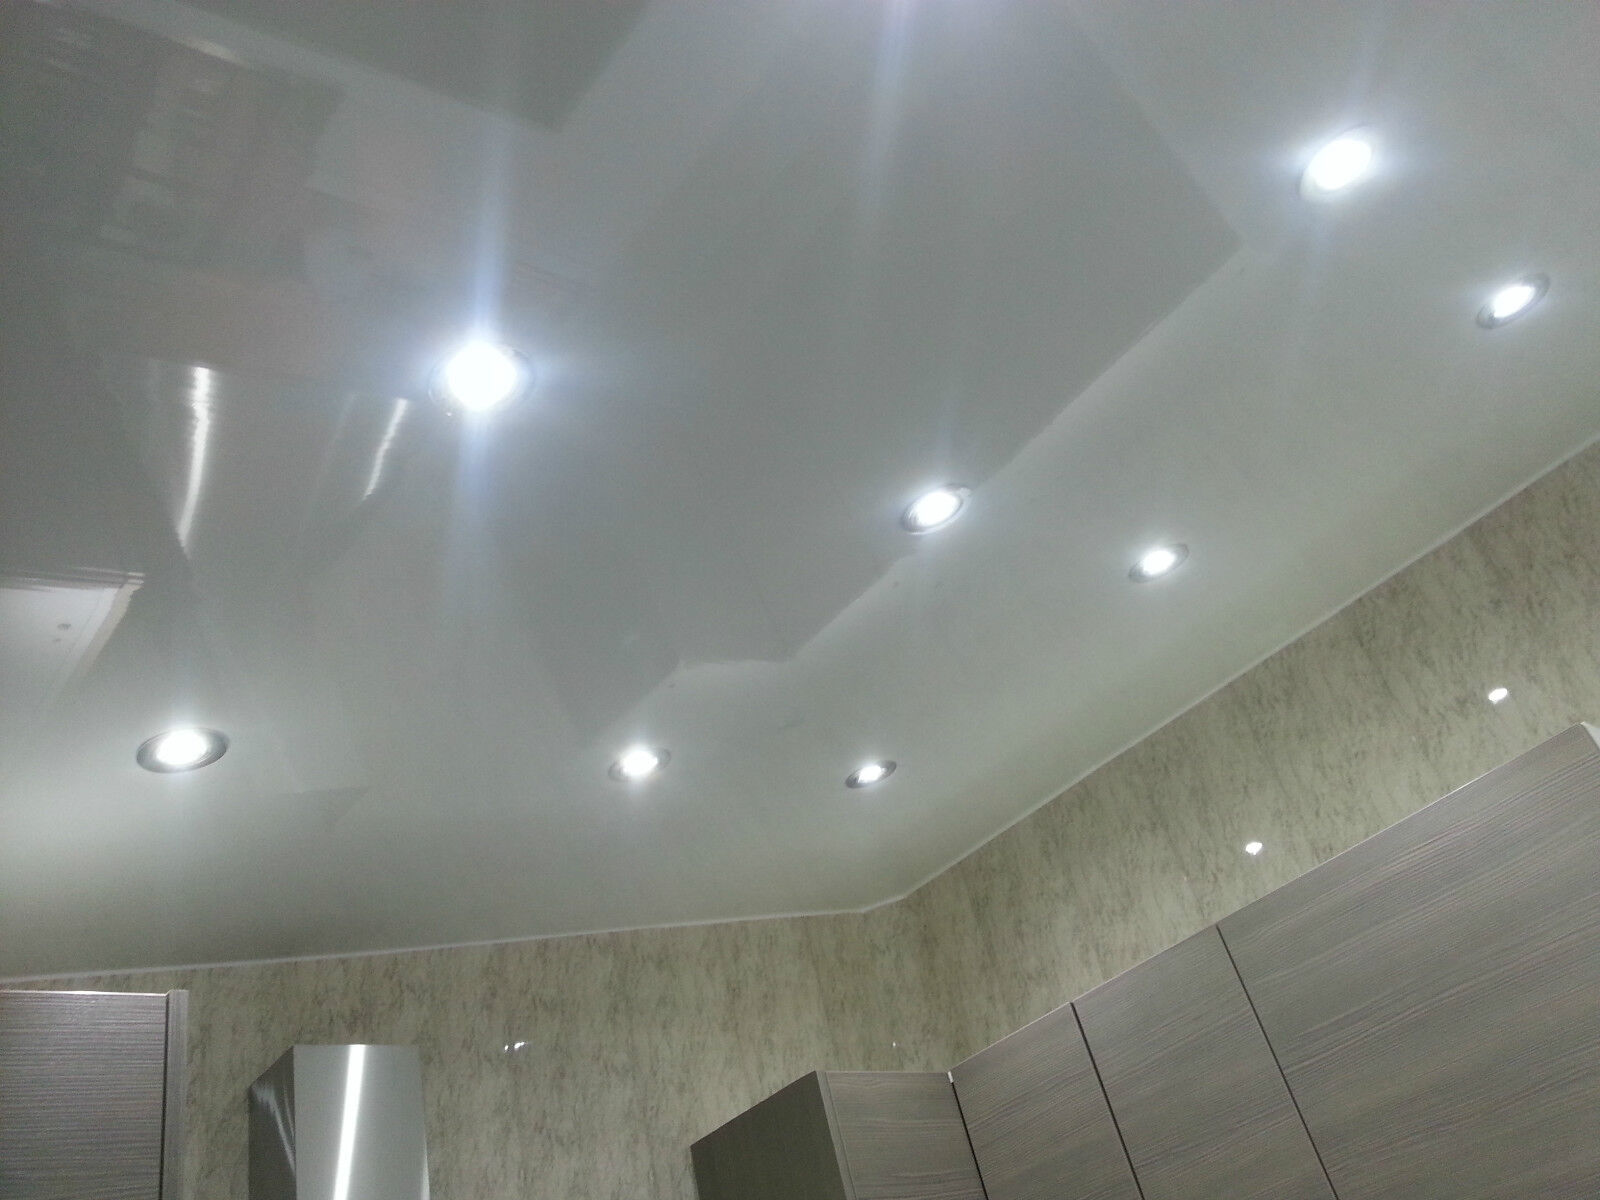 Pvc Ceiling Panels : Plain white gloss pvc kitchen ceiling cladding panels